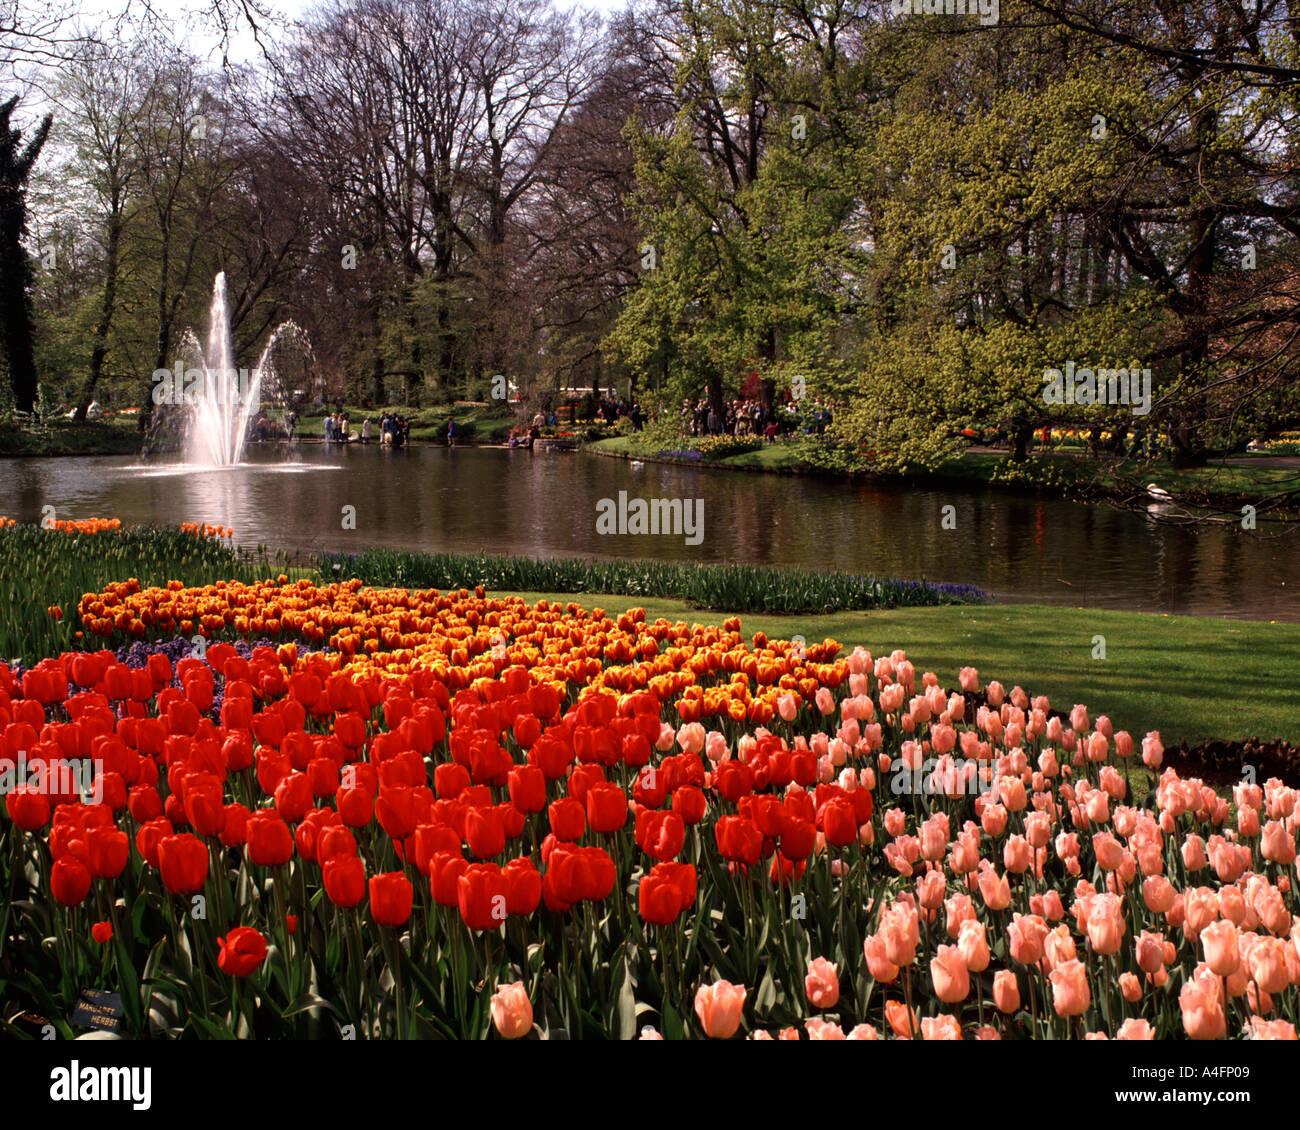 Keukenhof Gardens, Lisse, Holland Stock Photo: 3602952 - Alamy